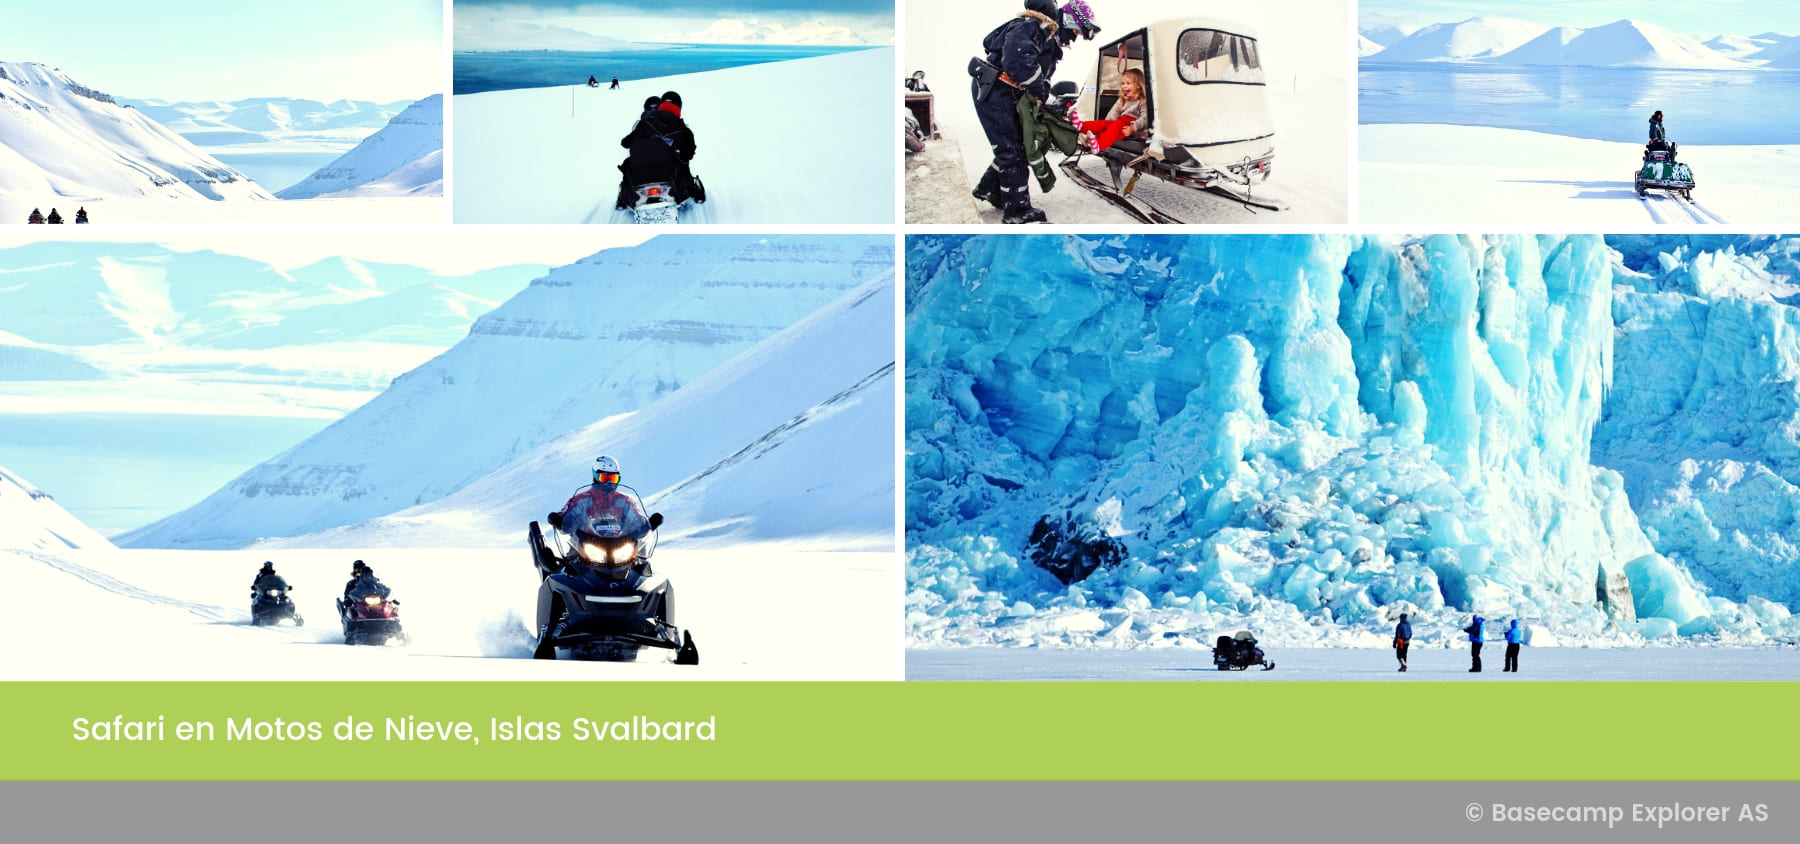 Safari en Motos de Nieve, Islas Svalbard